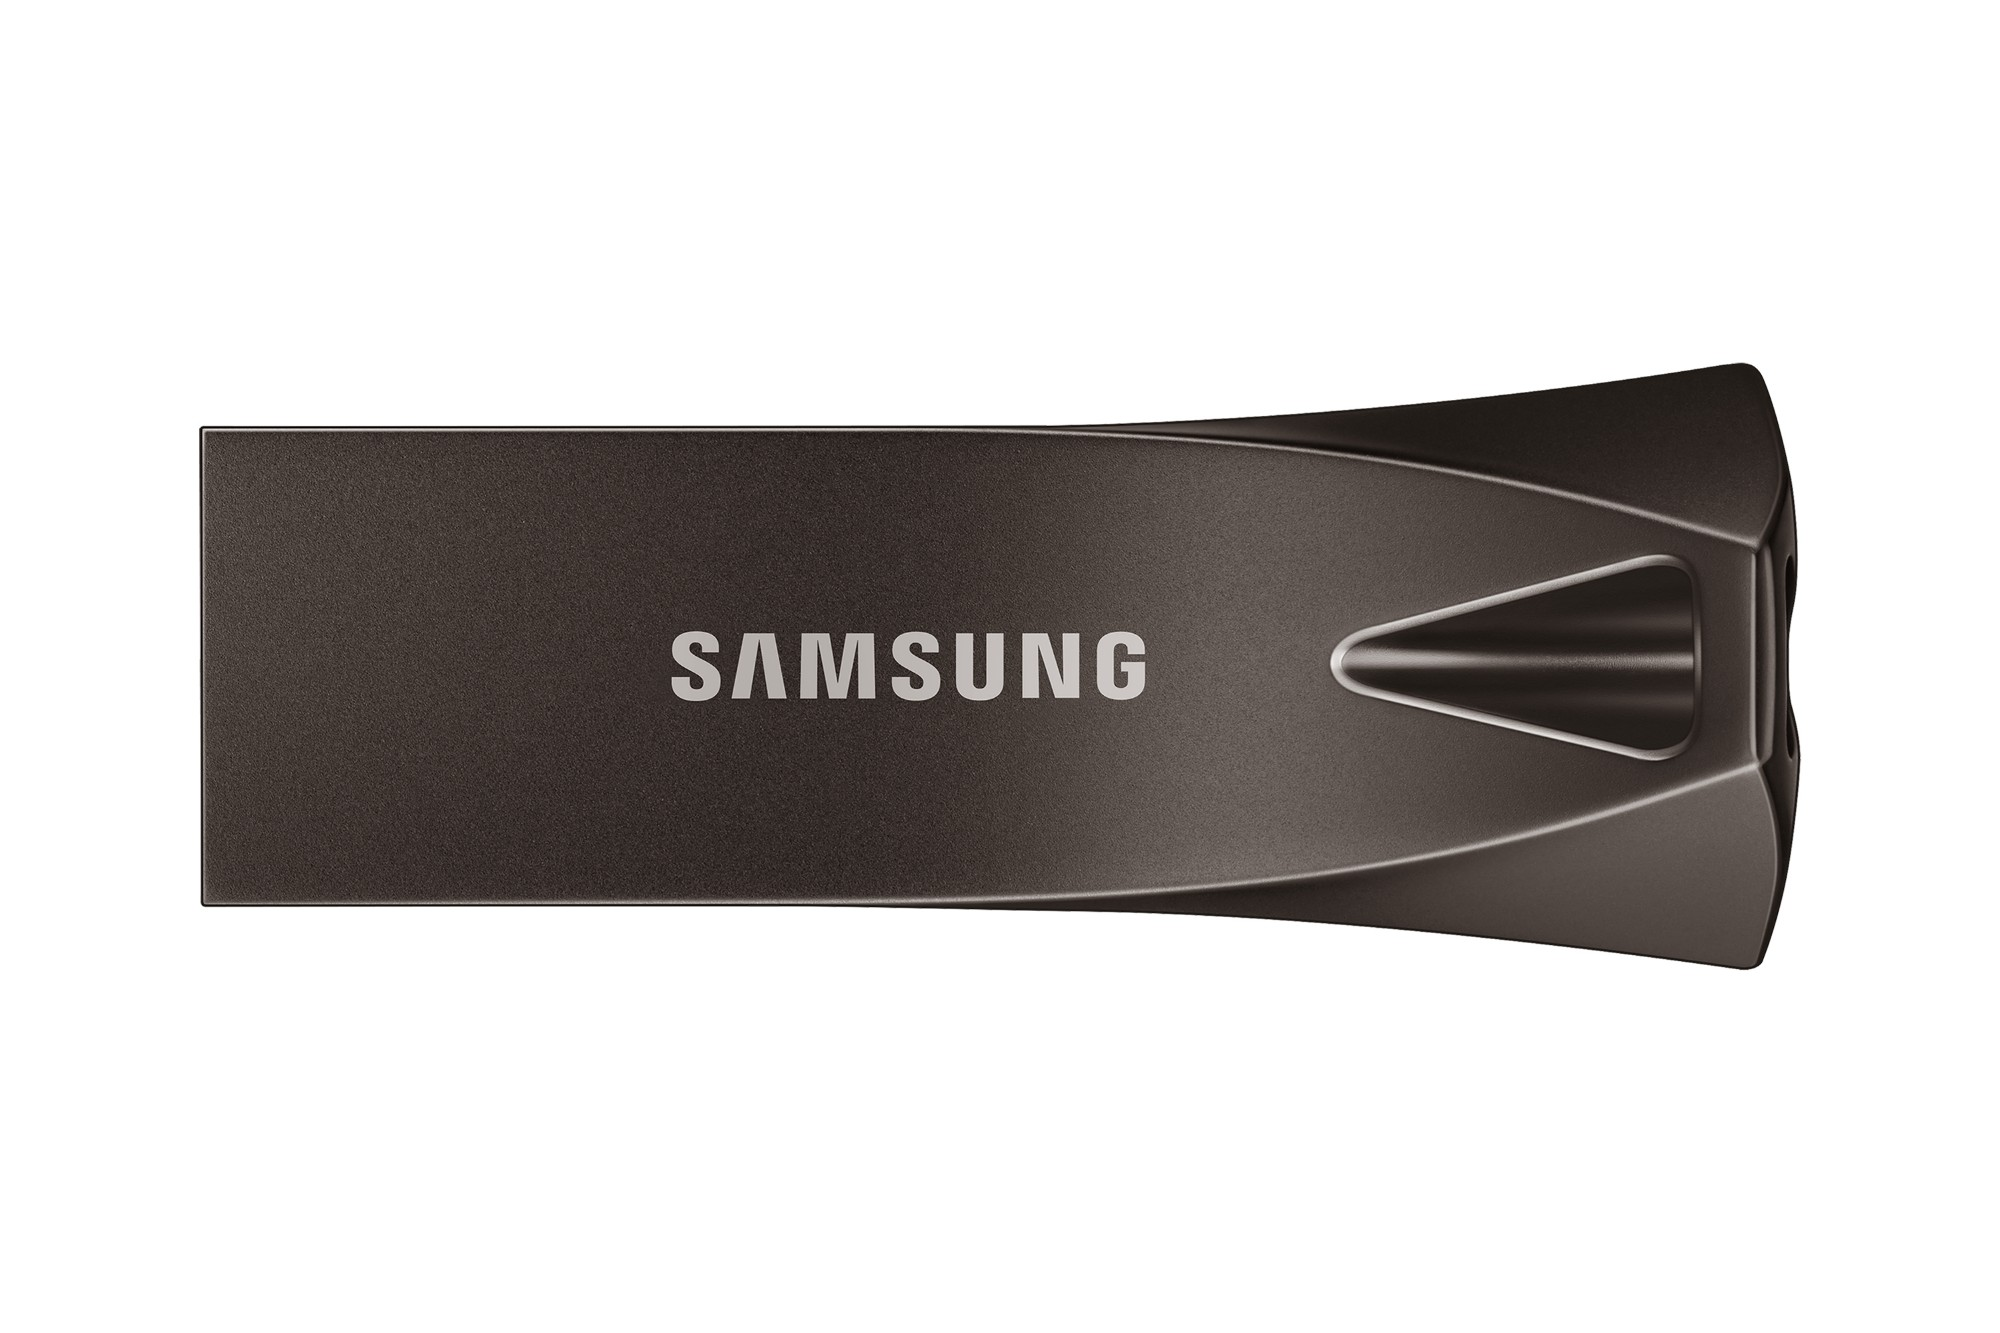 Samsung MUF-128BE USB flash drive 128 GB USB Type-A 3.2 Gen 1 (3.1 Gen 1) Grey, Titanium